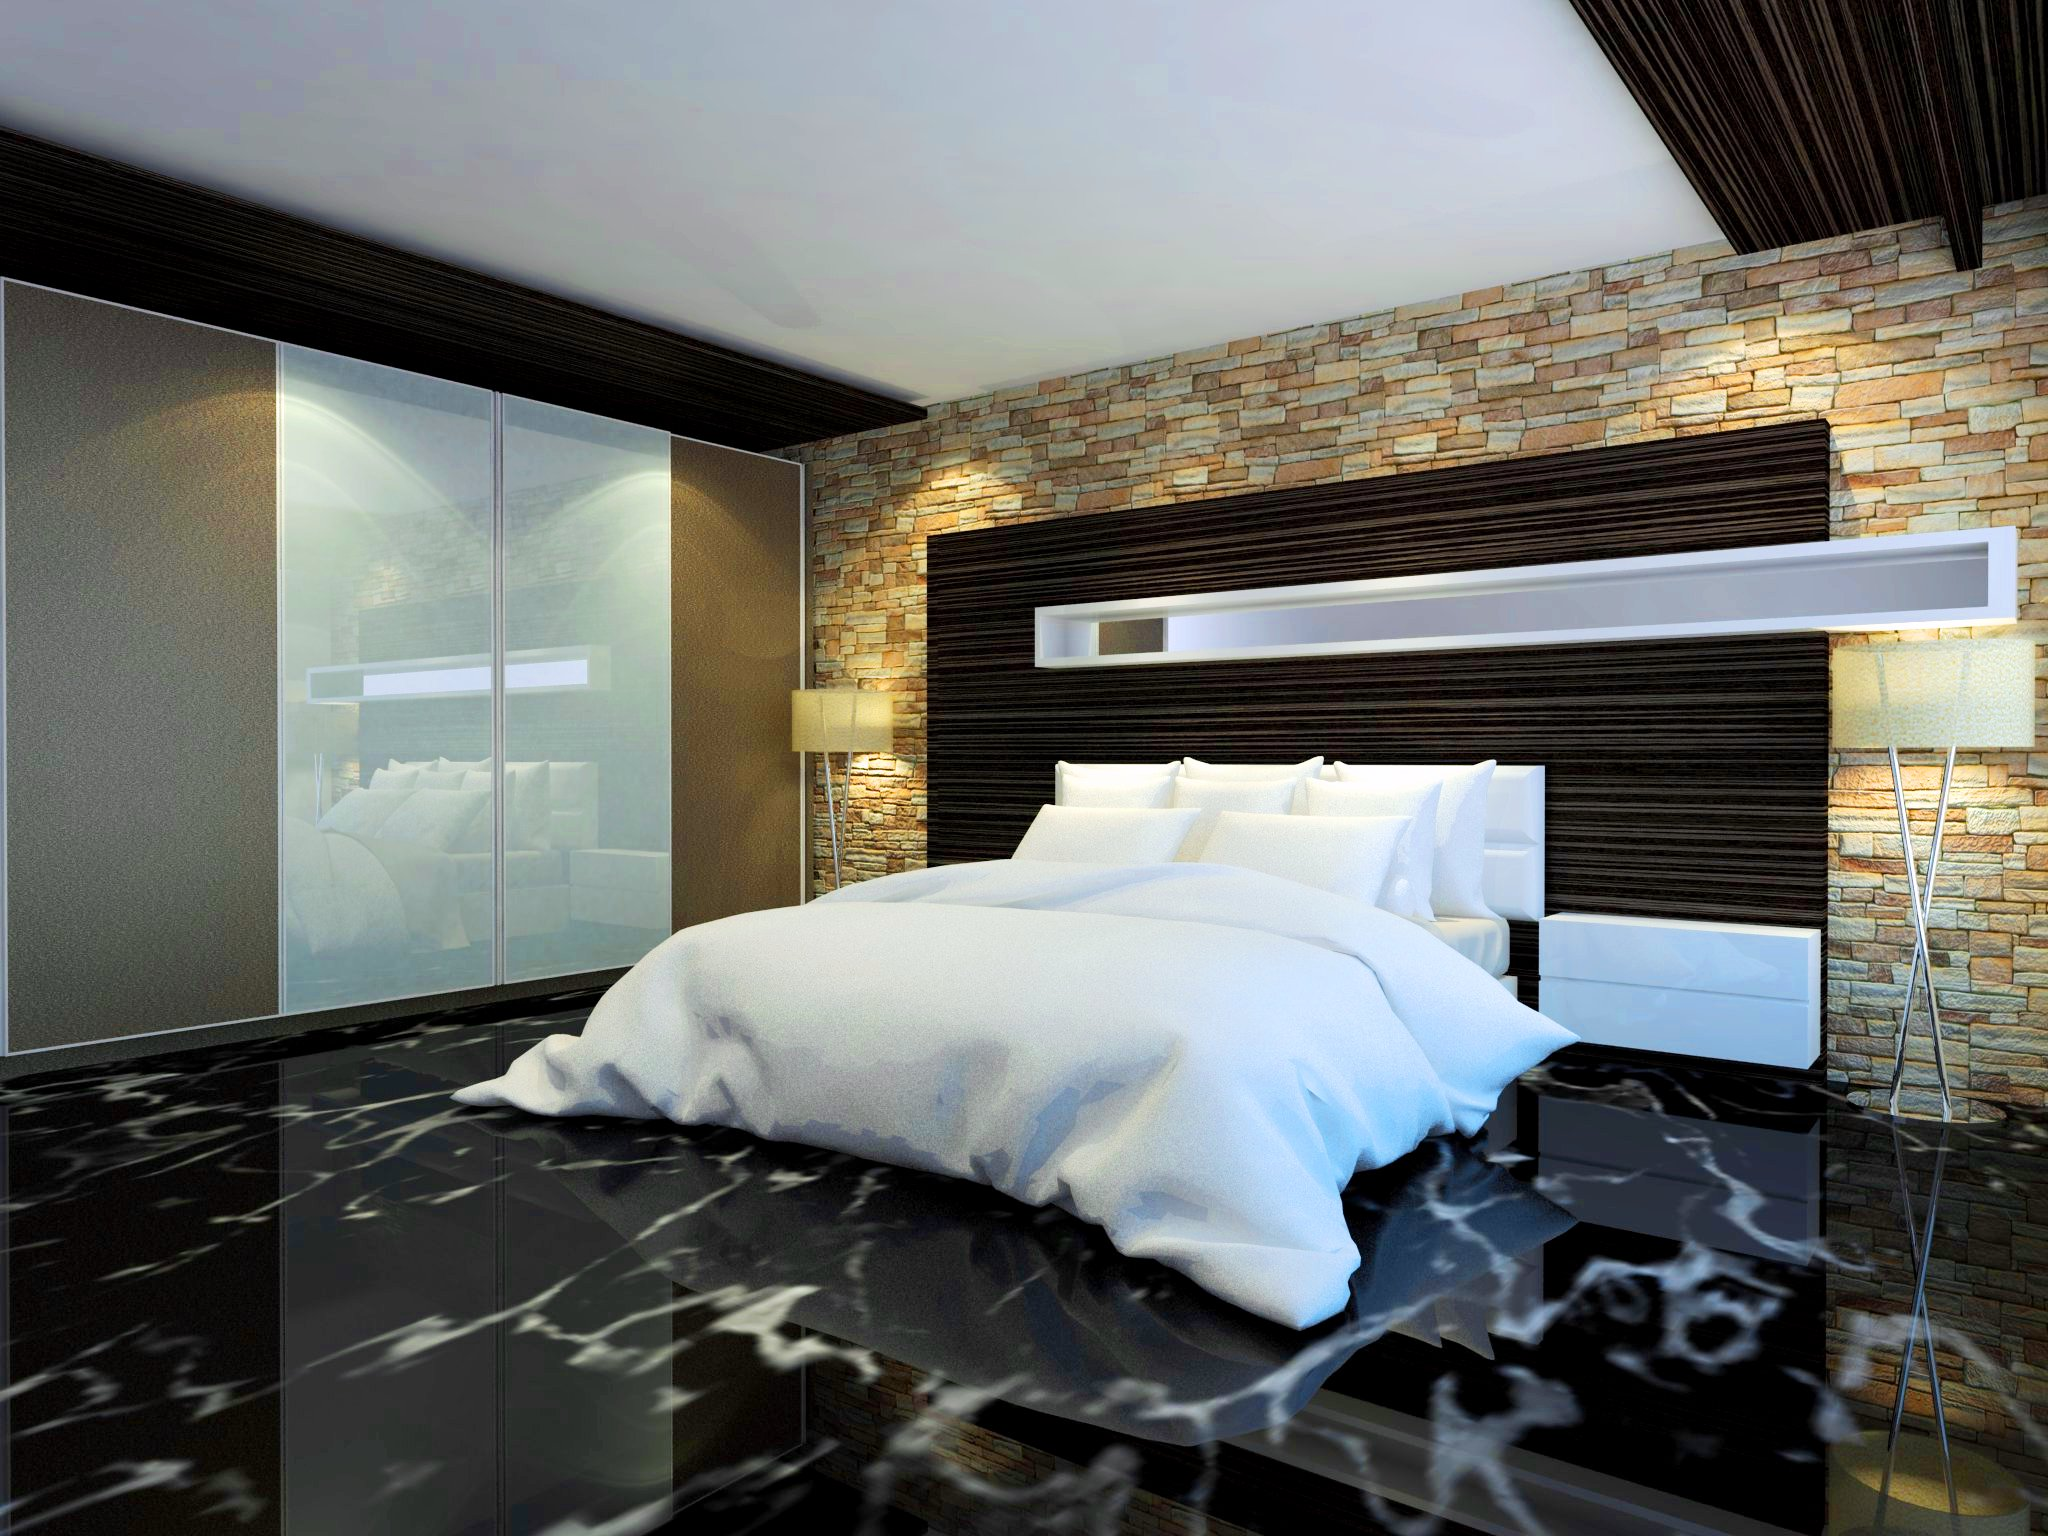 Interior desain apartemen di kapuk, jakarta utara